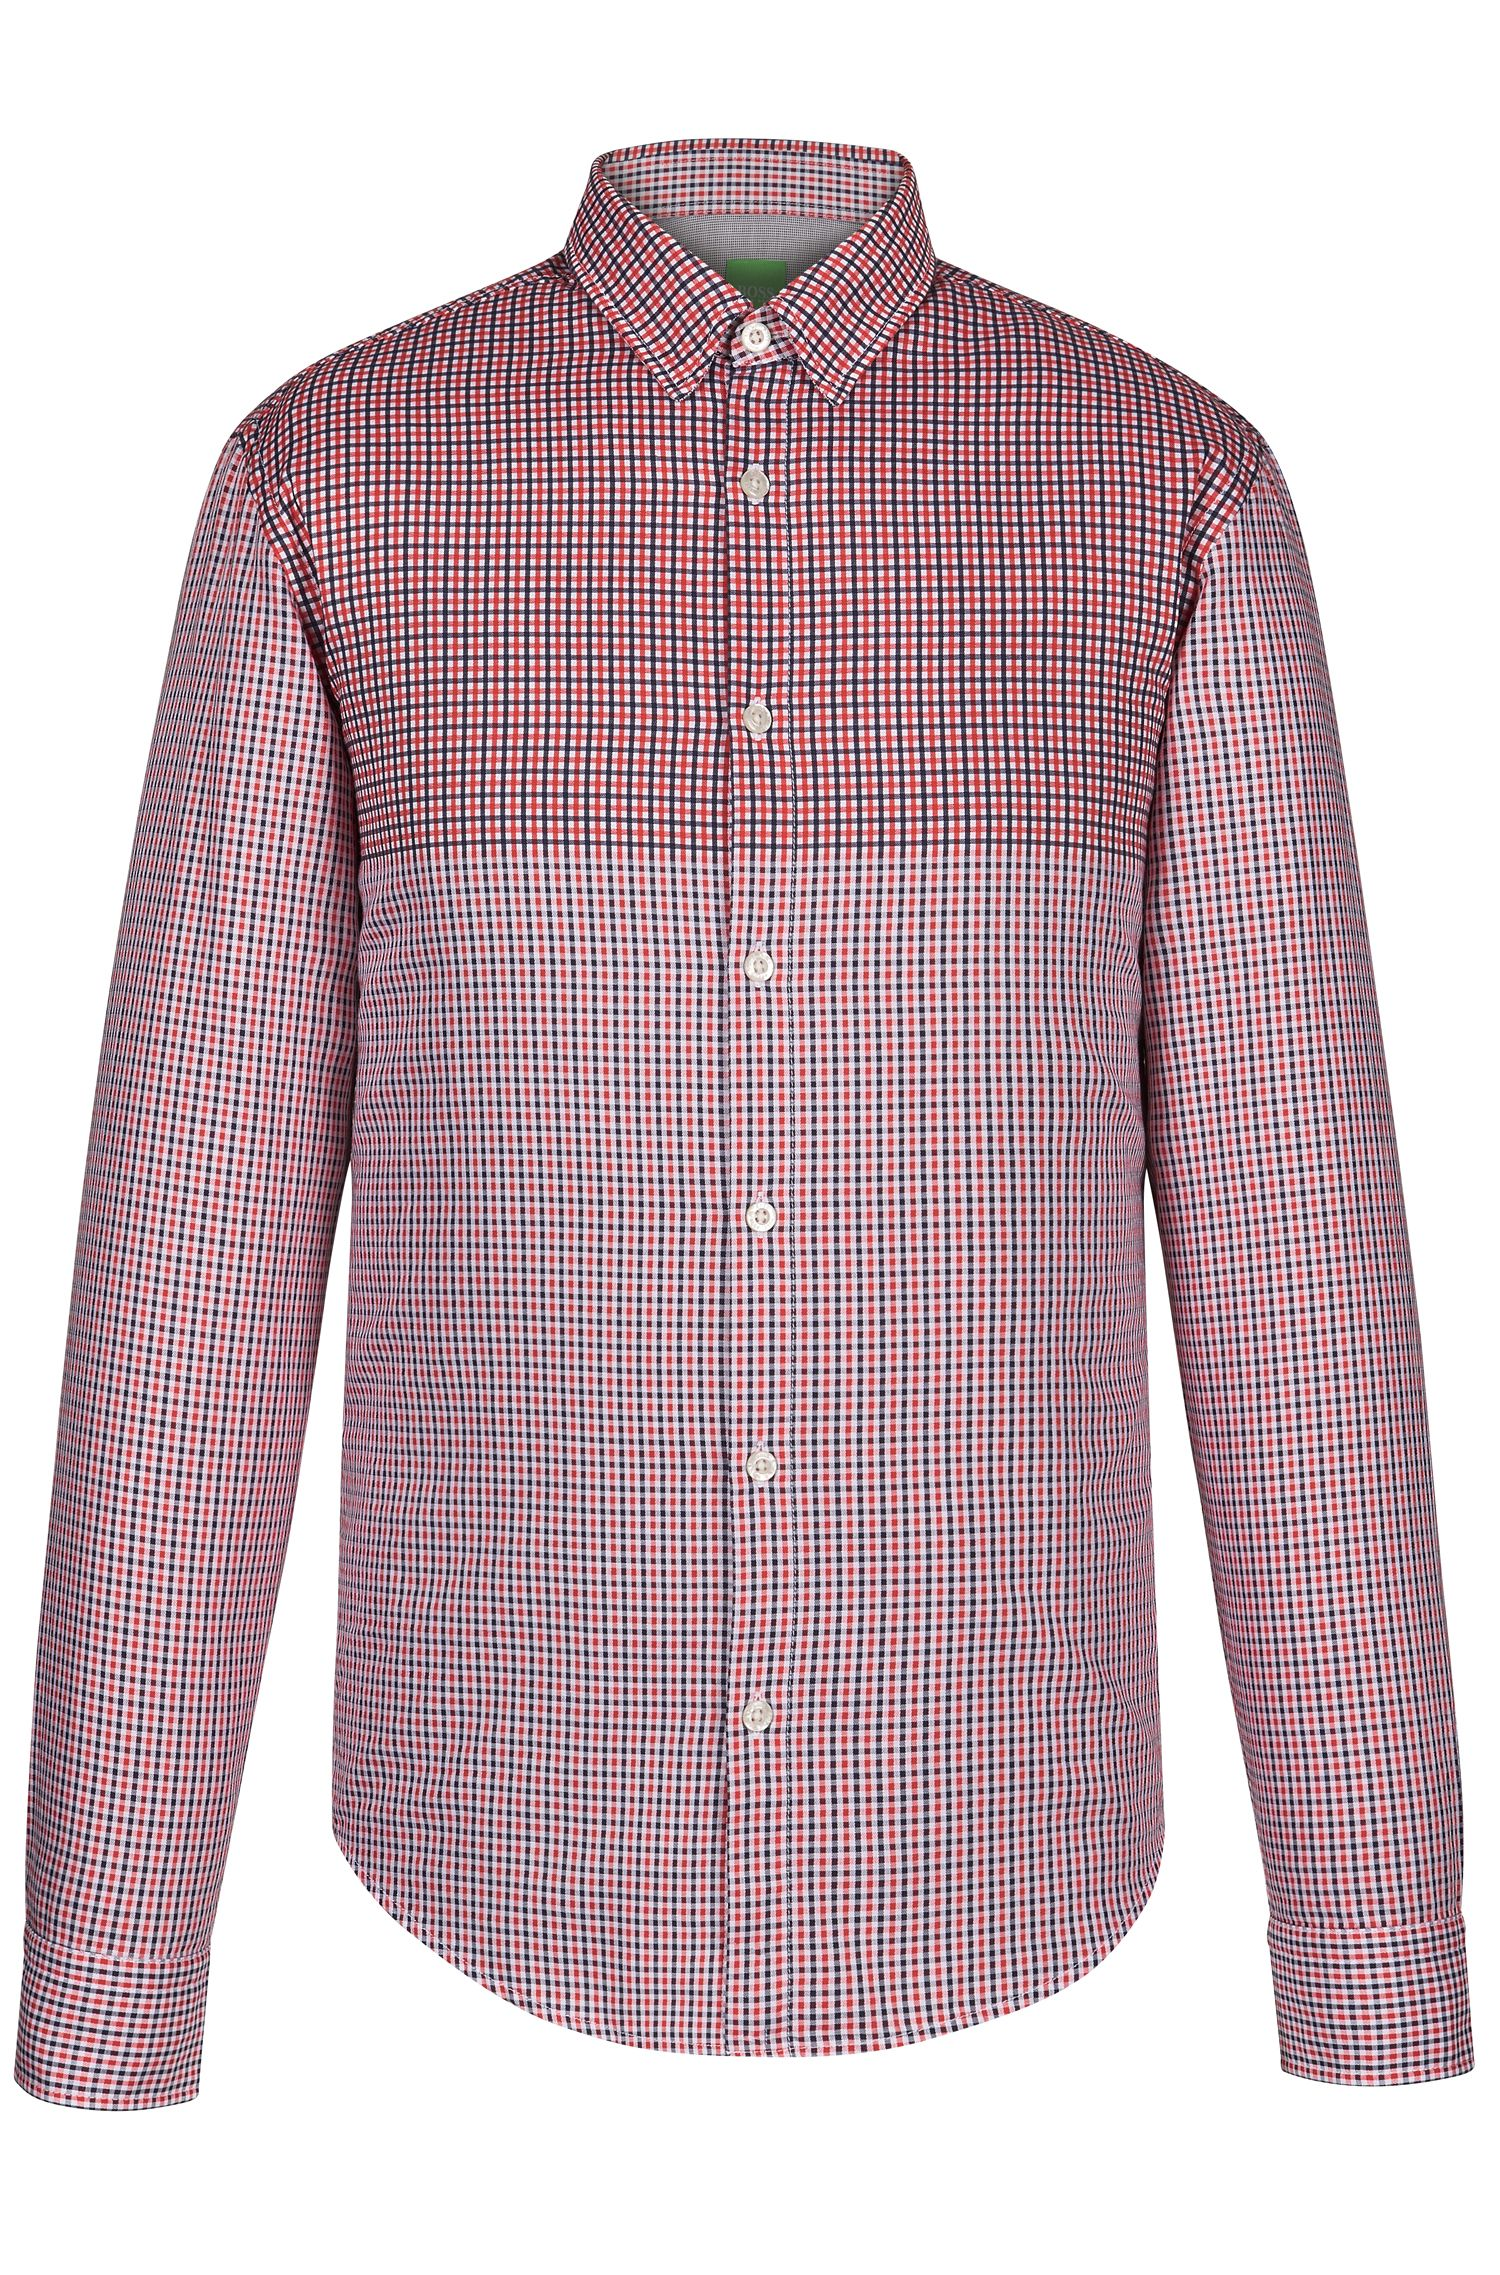 'C-Briar' | Regular Fit, Checked Cotton Button Down Shirt